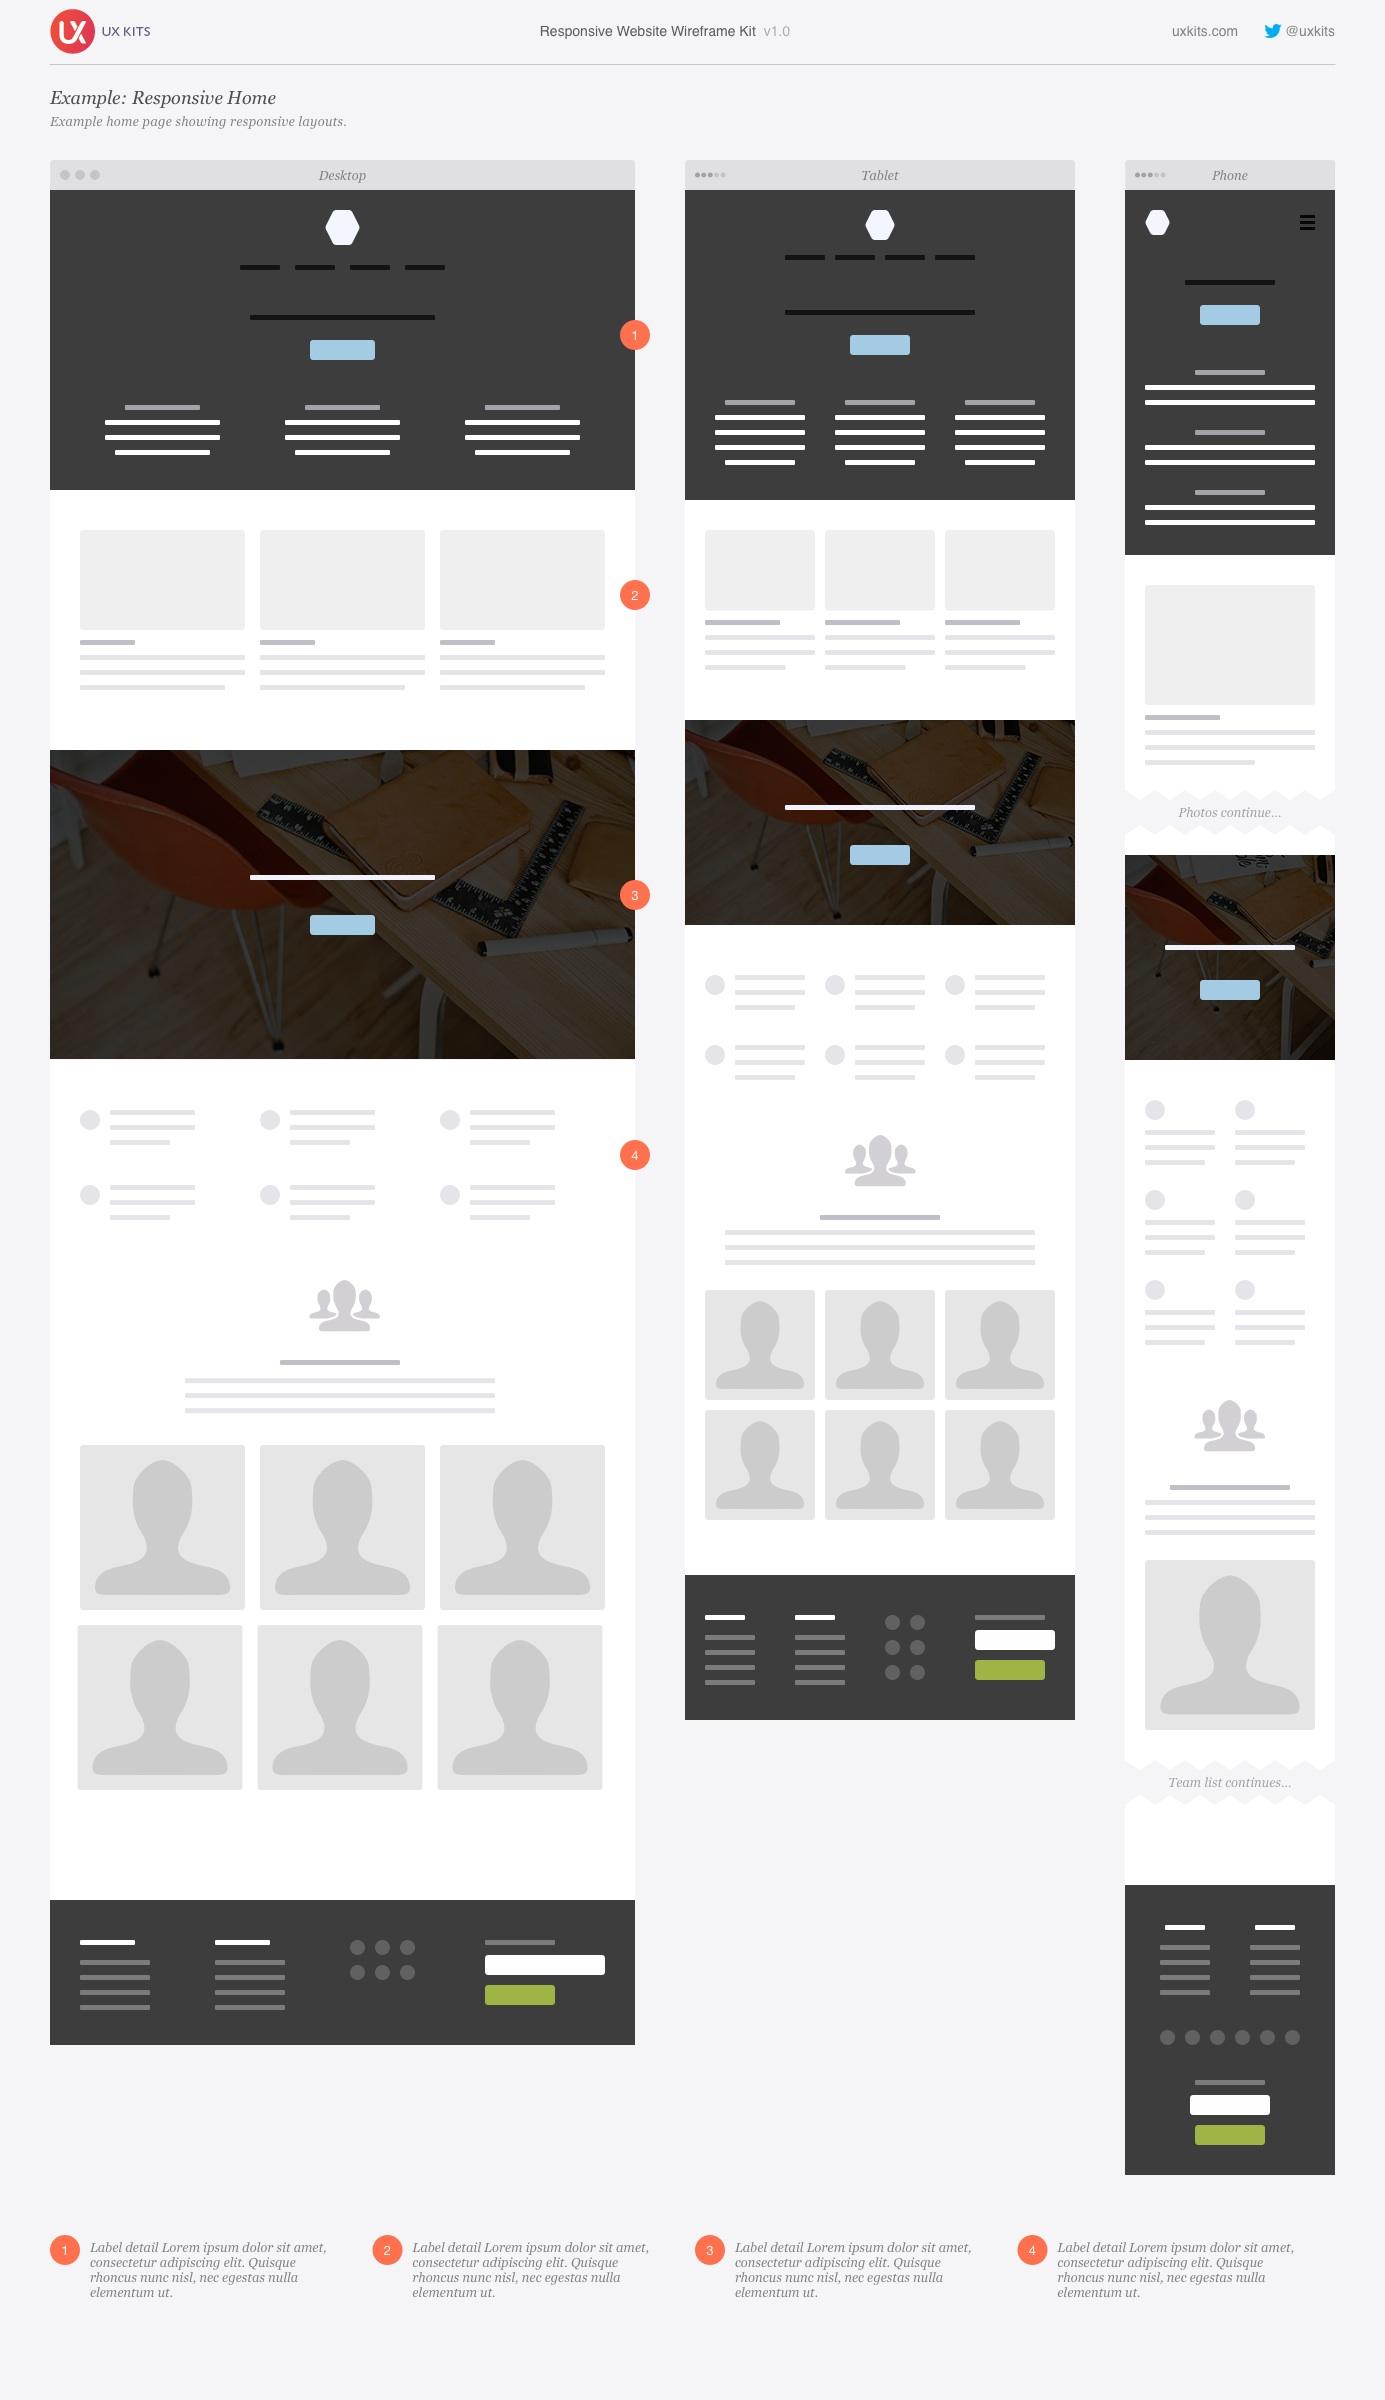 Adobe Illustrator Responsive Web Design Template